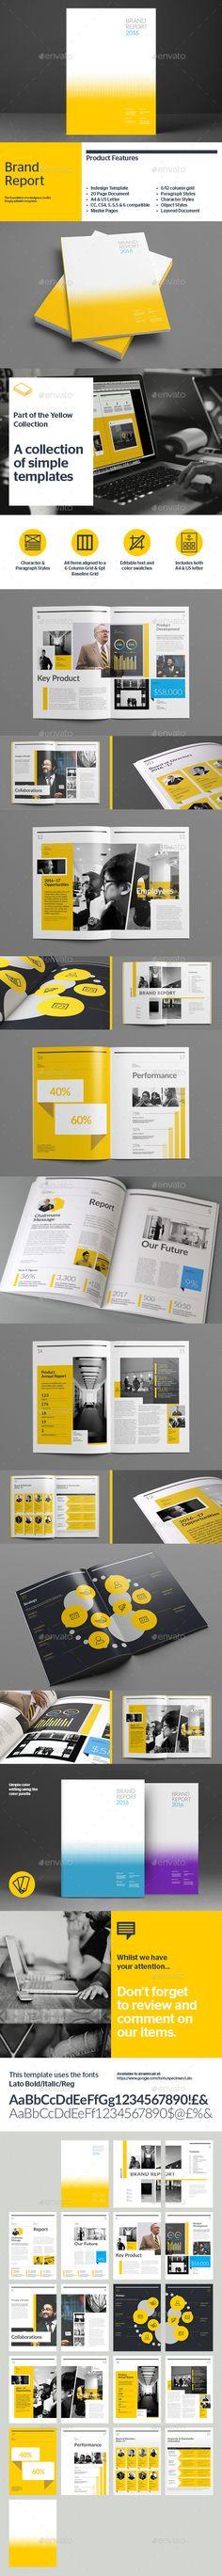 Brand Report Brochure / Book Template #design Download: http://graphicriver.net/item/brand-report/9959444?ref=ksioks